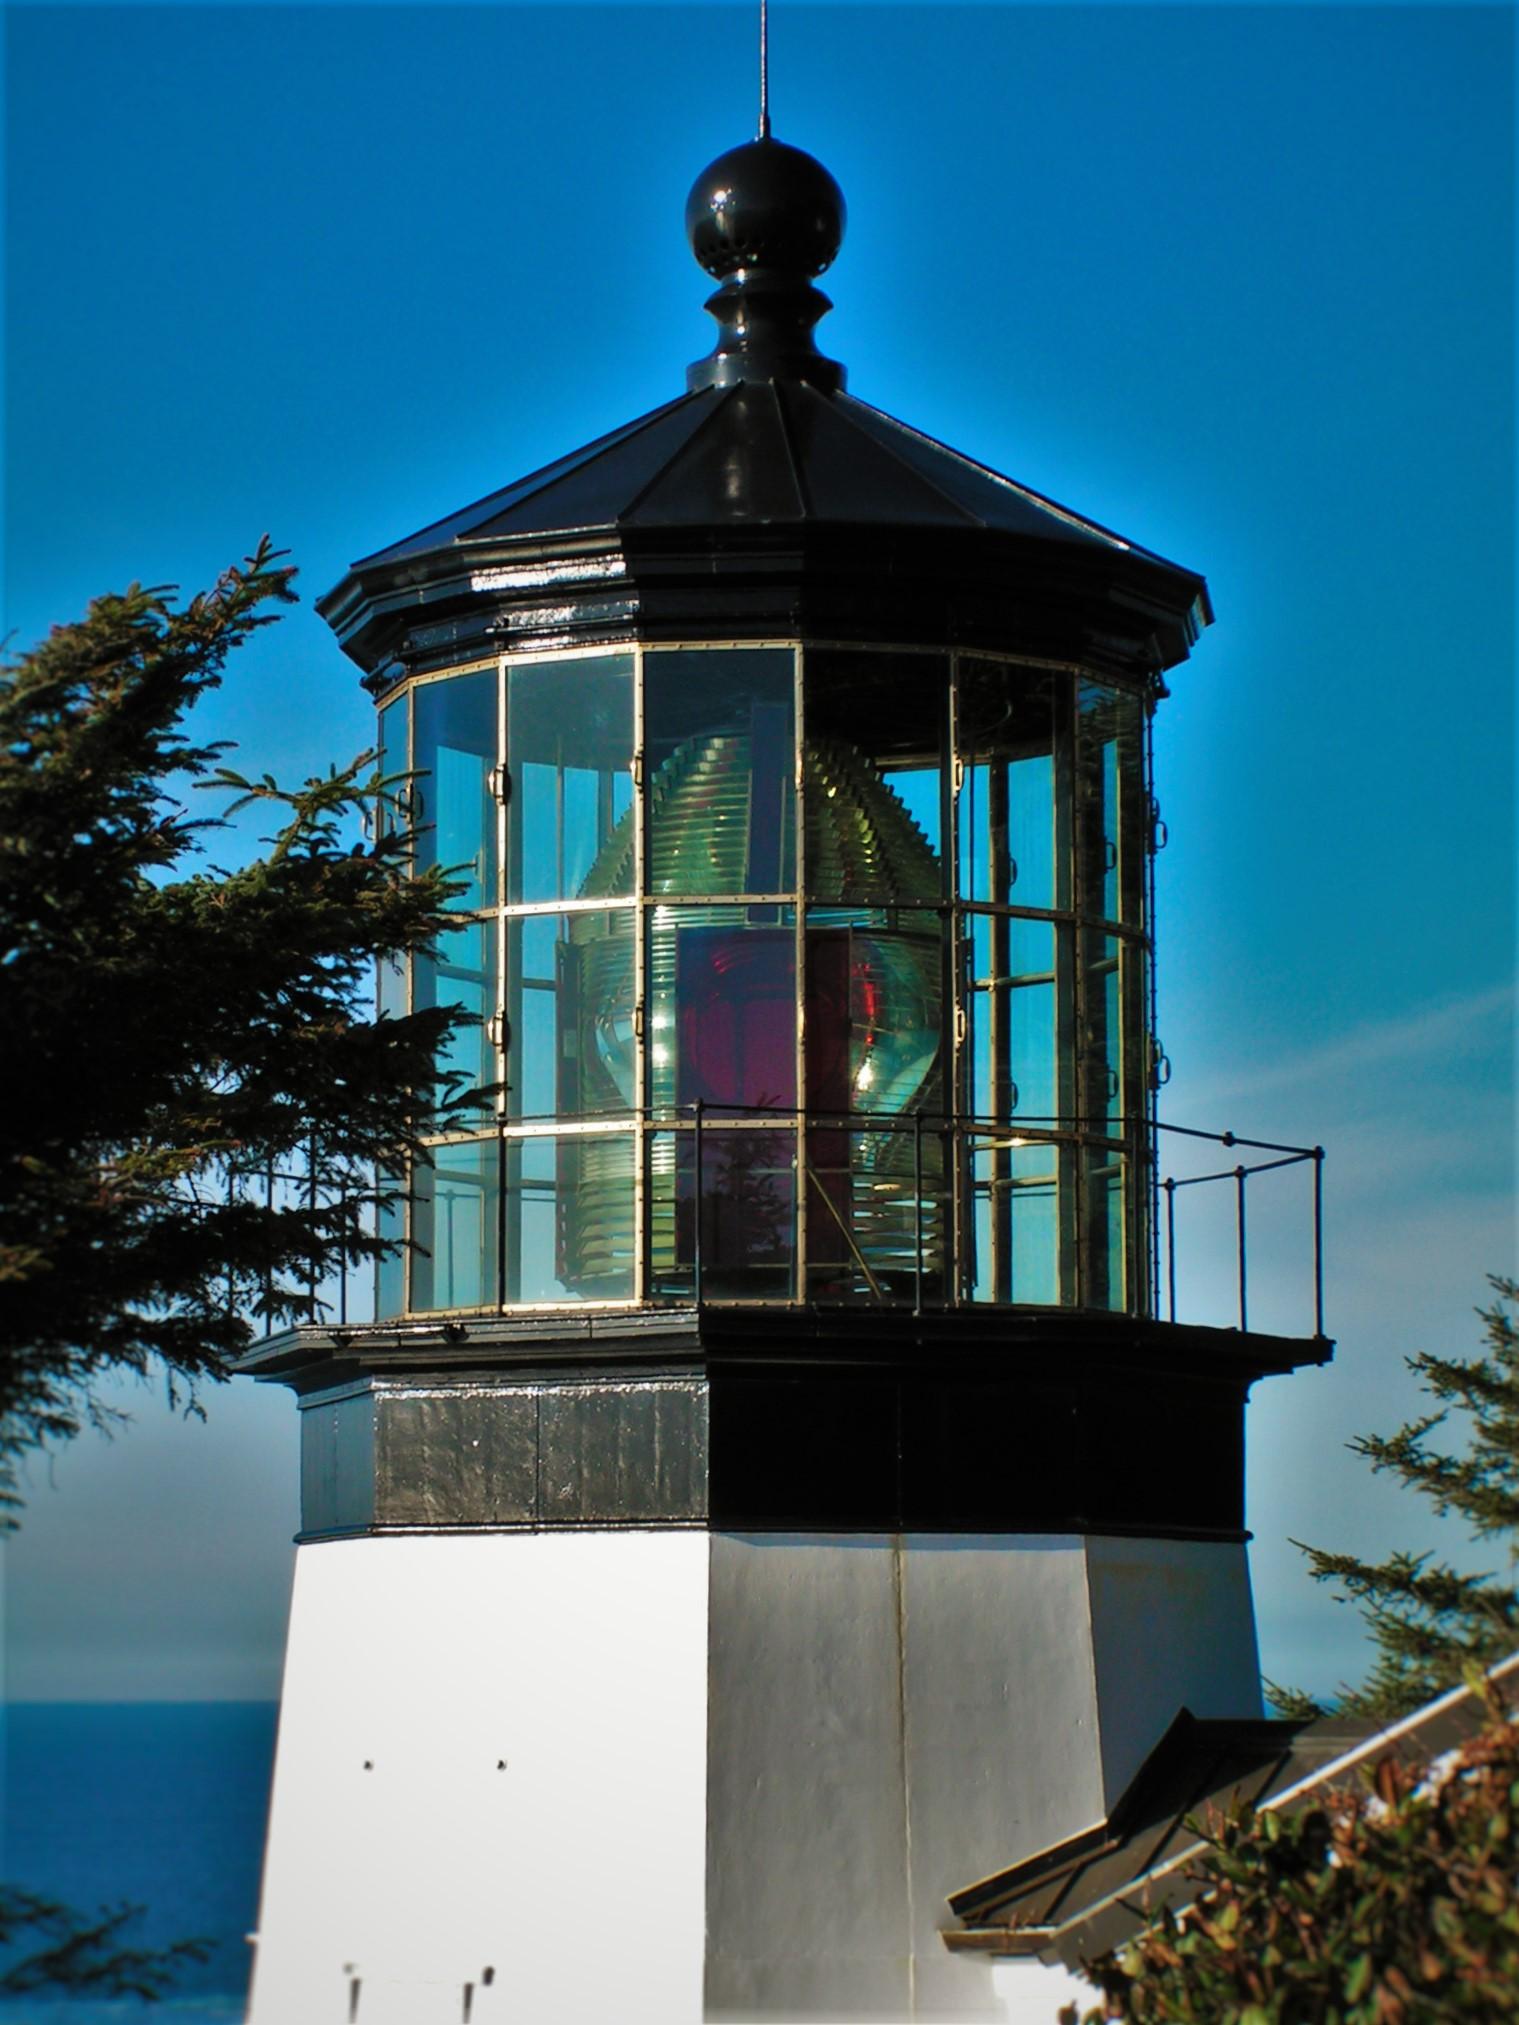 Cape Meares Lighthouse Tillamook Oregon Coast 2traveldads.com